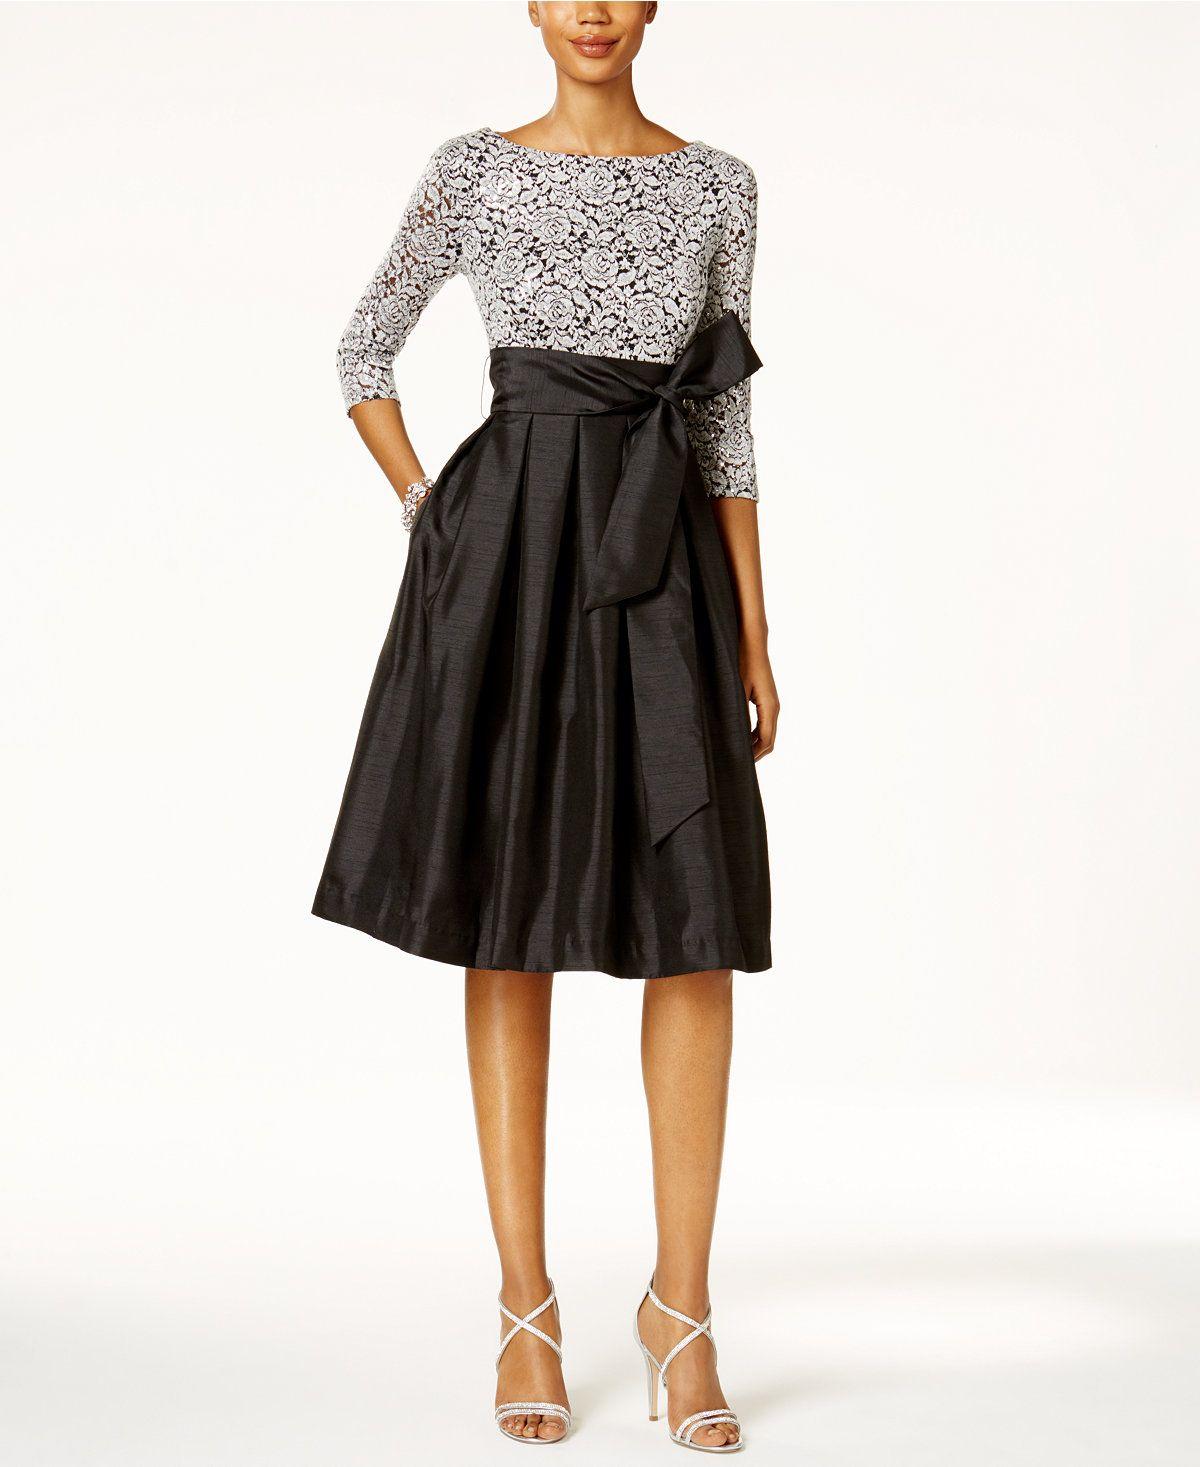 Macys womens dresses wedding  Jessica Howard Sequined Lace Taffeta Fit u Flare Dress  Fit flare